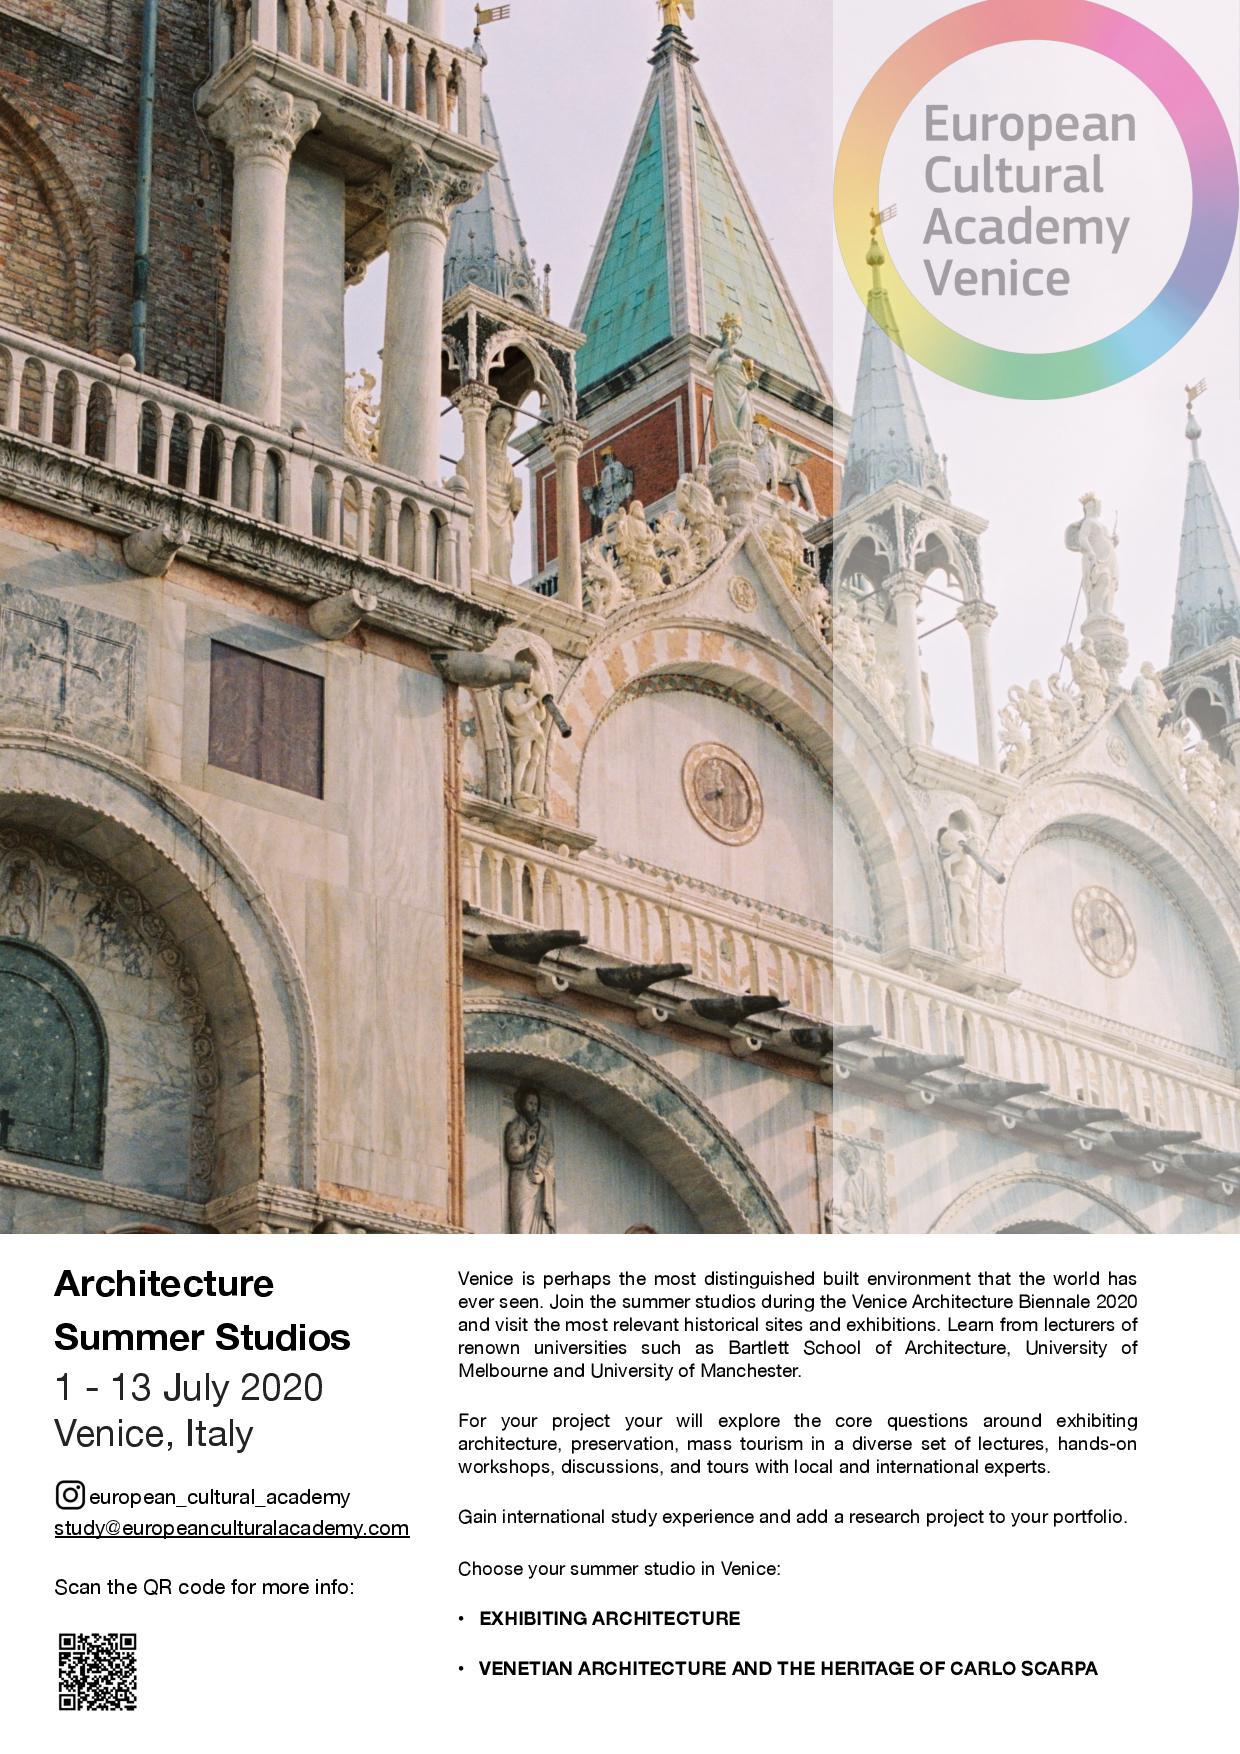 ECA_Summer_Studios_Architecture-page-001